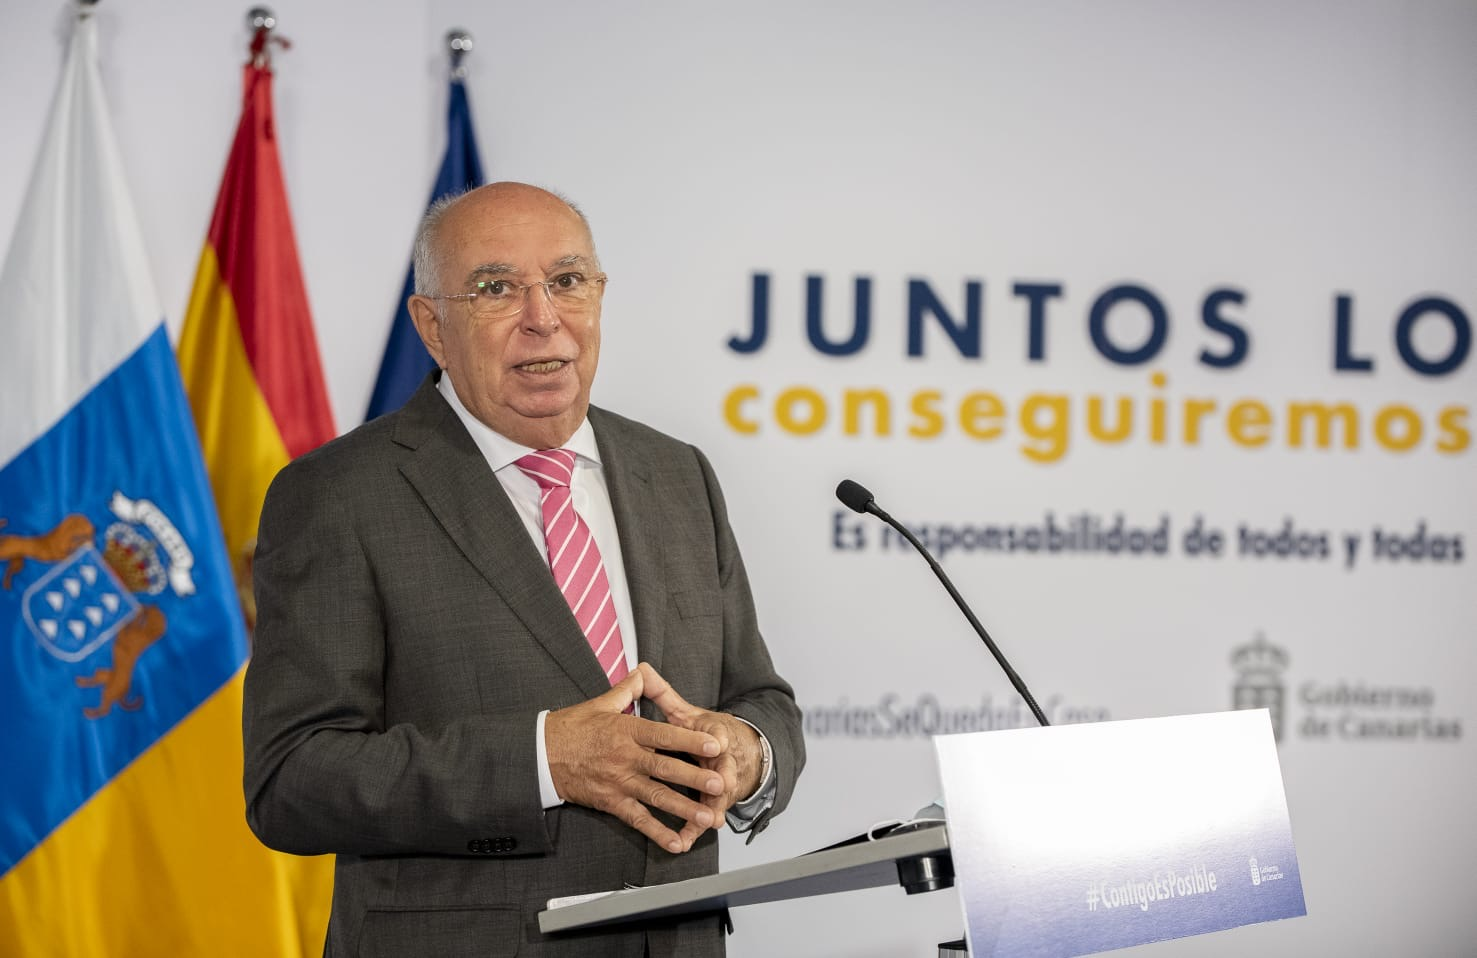 Juan Francisco Trujillo, director general de Relaciones Exteriores